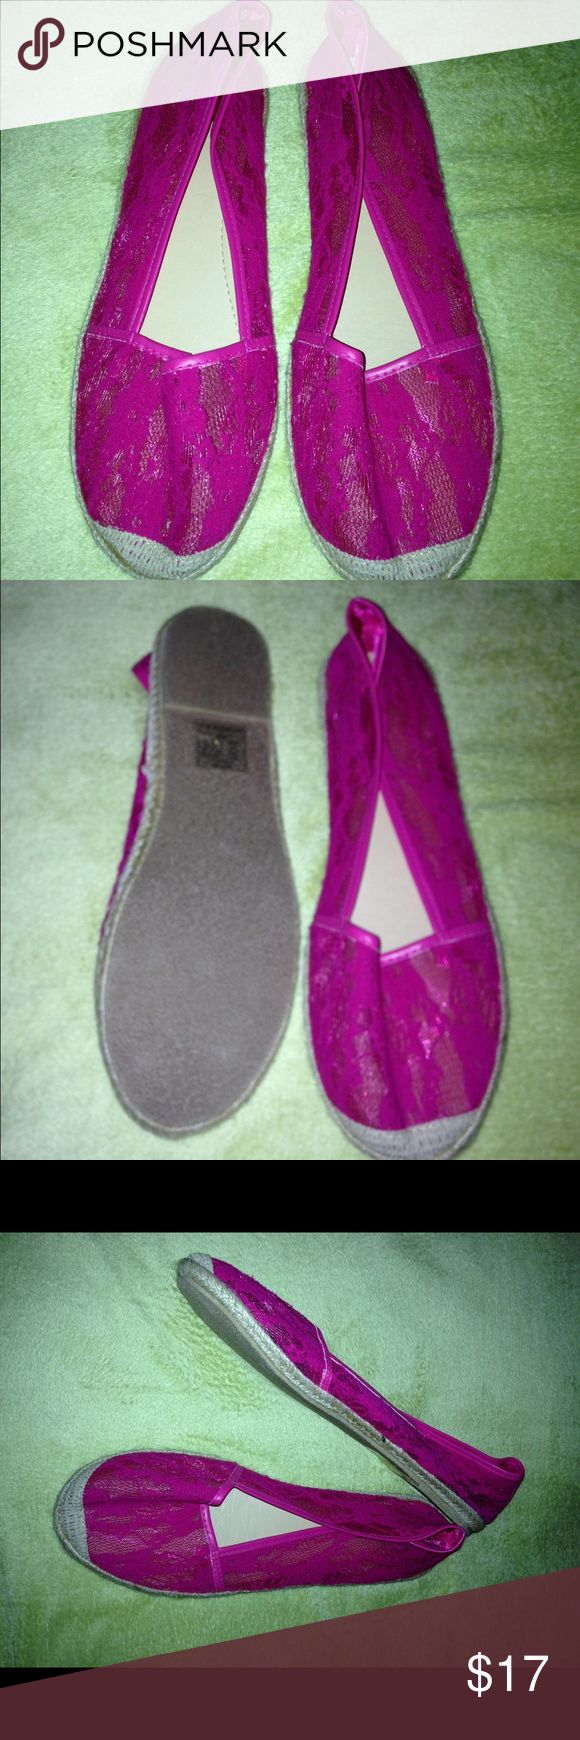 NEW Torrid Pink Espadrilles Shoes - Size 12 NEW Torrid Espadrilles. Size 12W.  Pink lace upper. Make an offer or save by bundling items! torrid Shoes Espadrilles